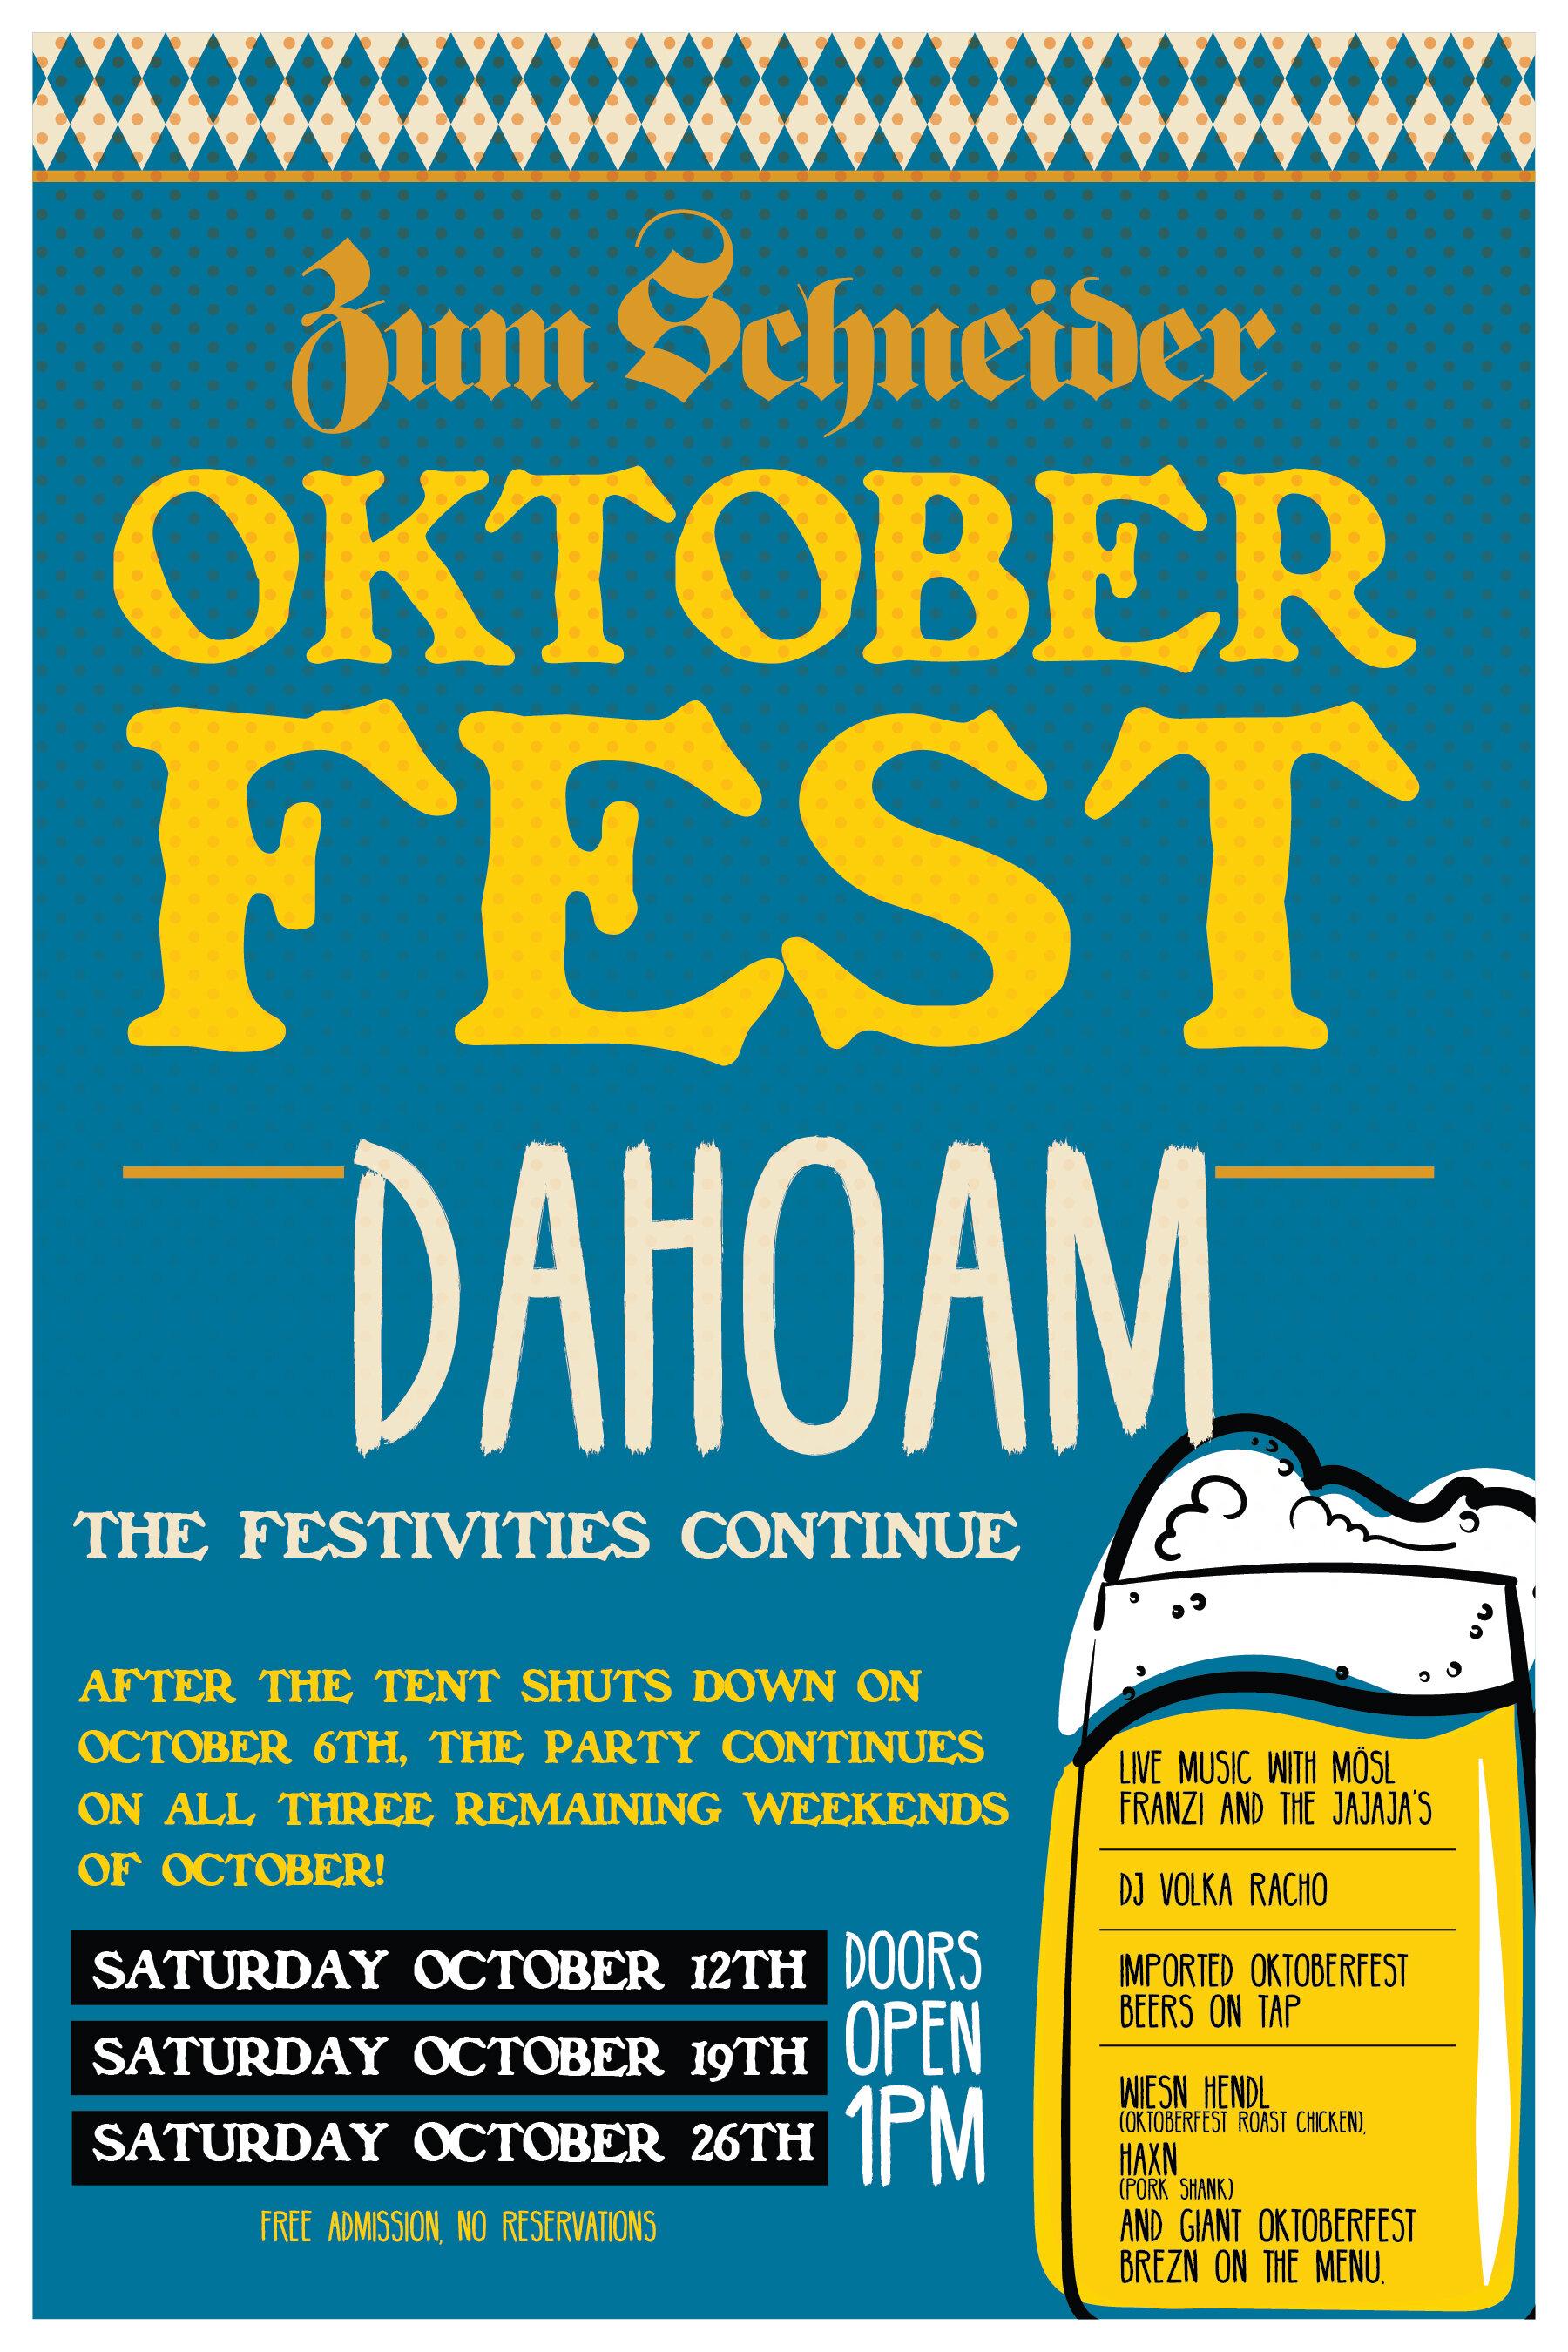 OKTOBERFEST_DAHOAM_ZUM-01.jpg